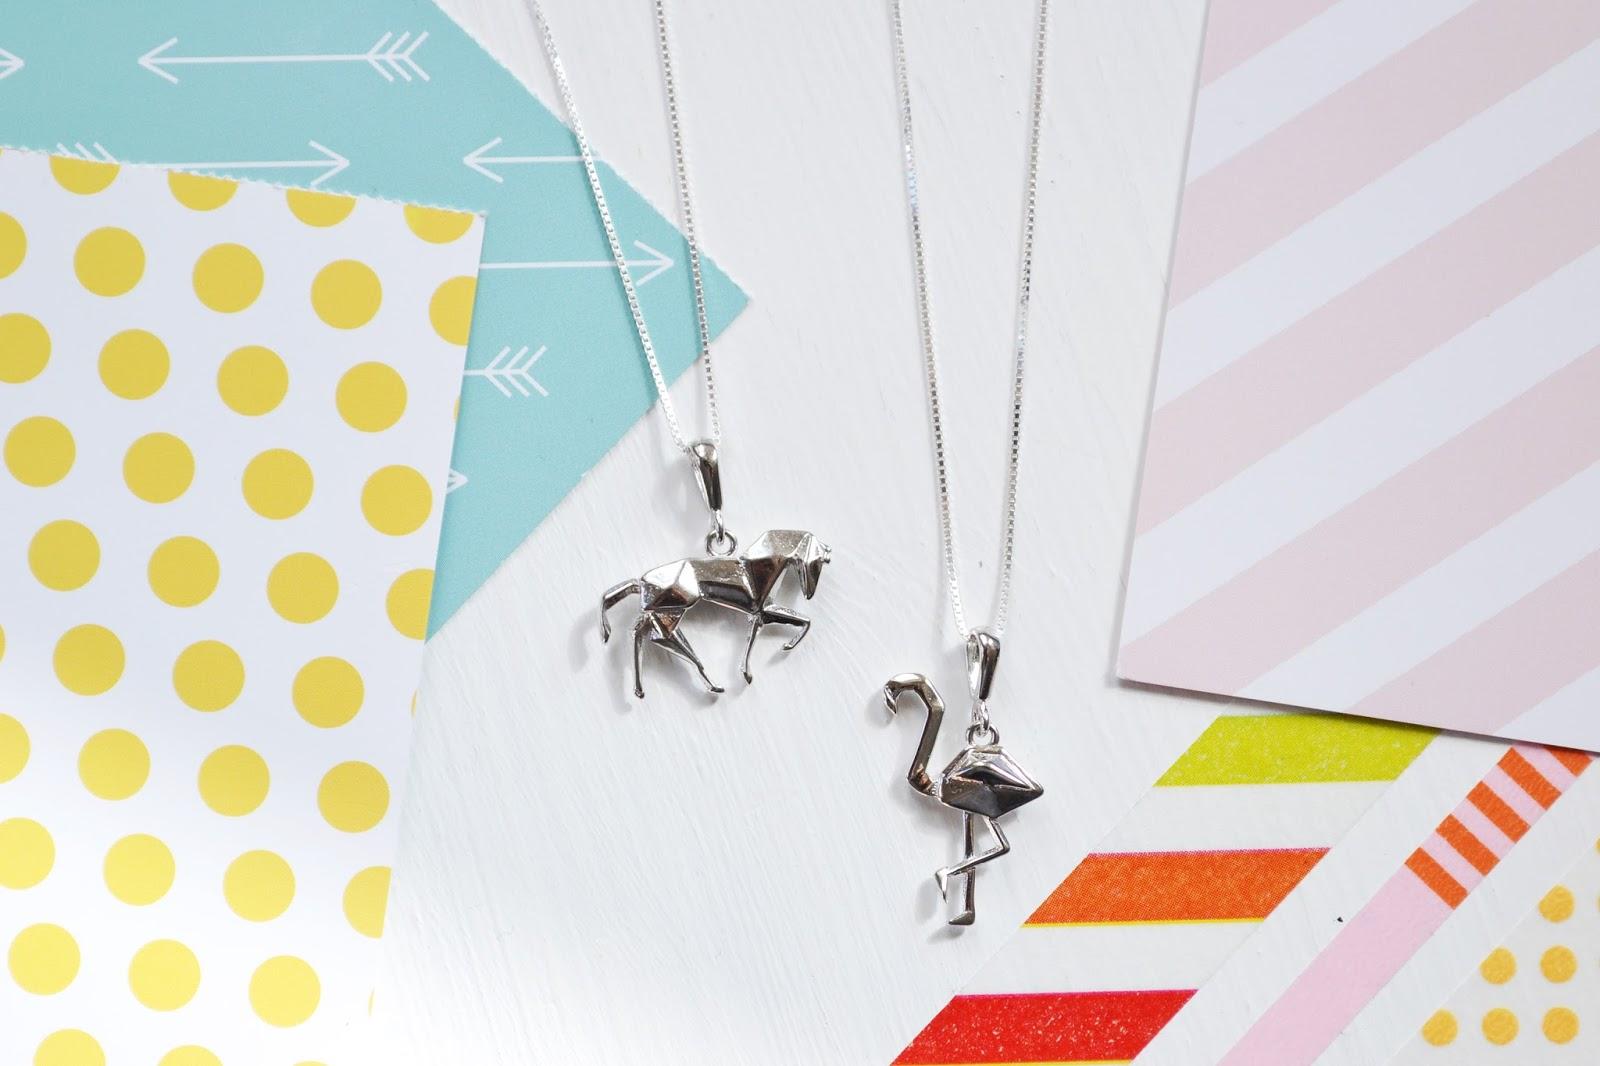 origami necklace, origami jewellery, horse charm, horse necklace, flamingo necklace